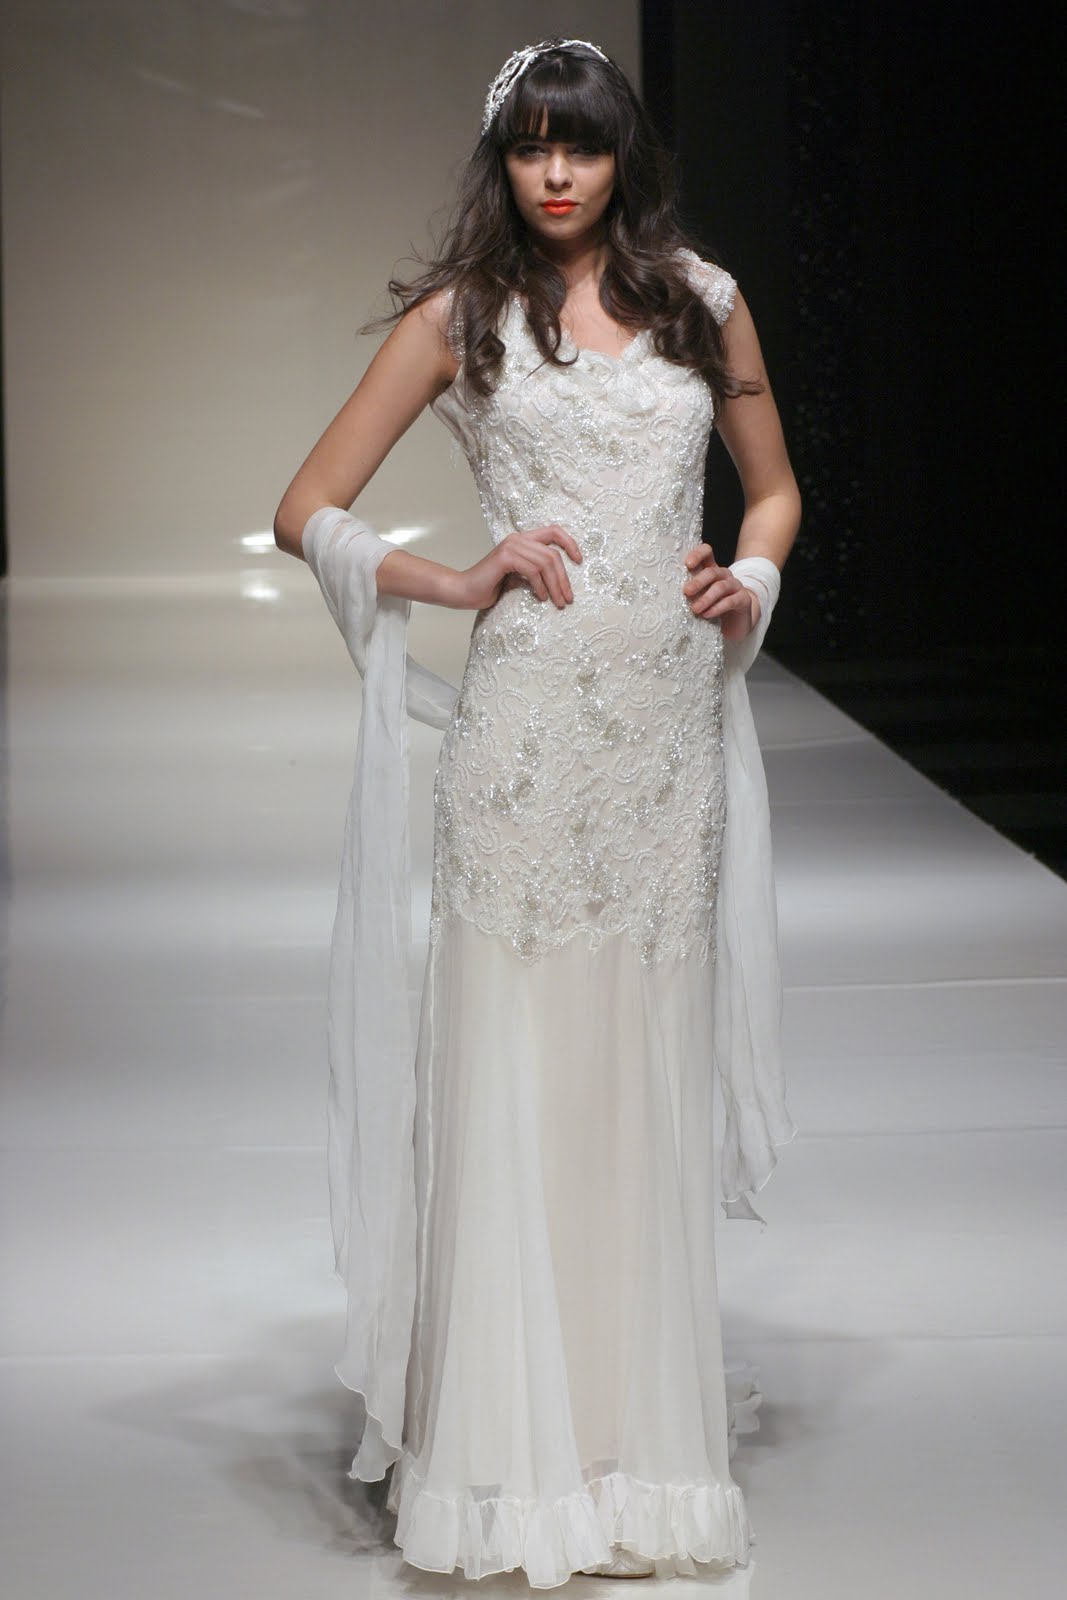 Wedding dresses knock off designer wedding dresses for Knock off wedding dresses